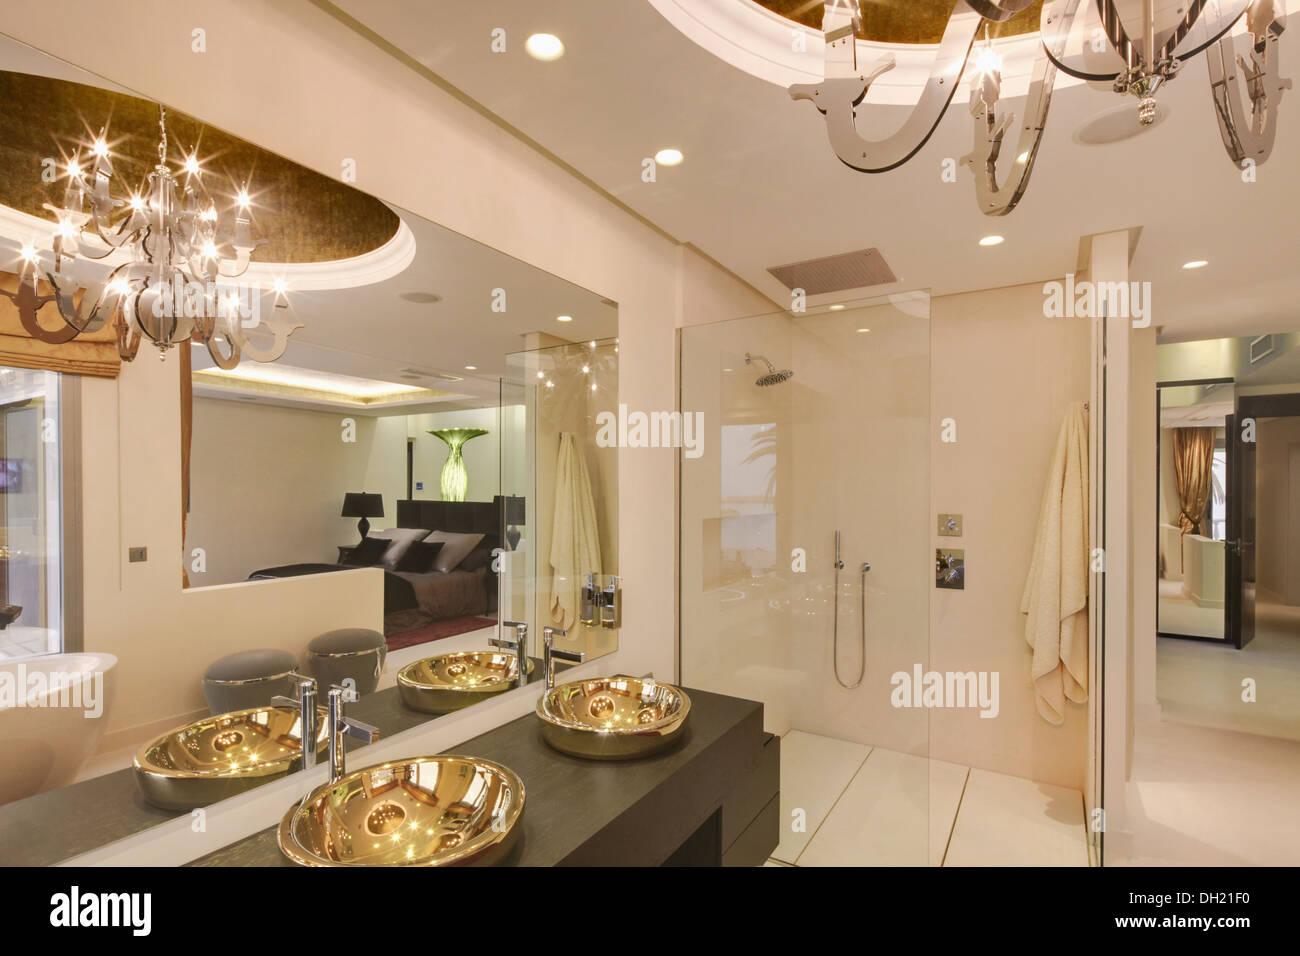 Bathroom In Spanish Large Mirror Above Gold Basins In Modern White Spanish Bathroom